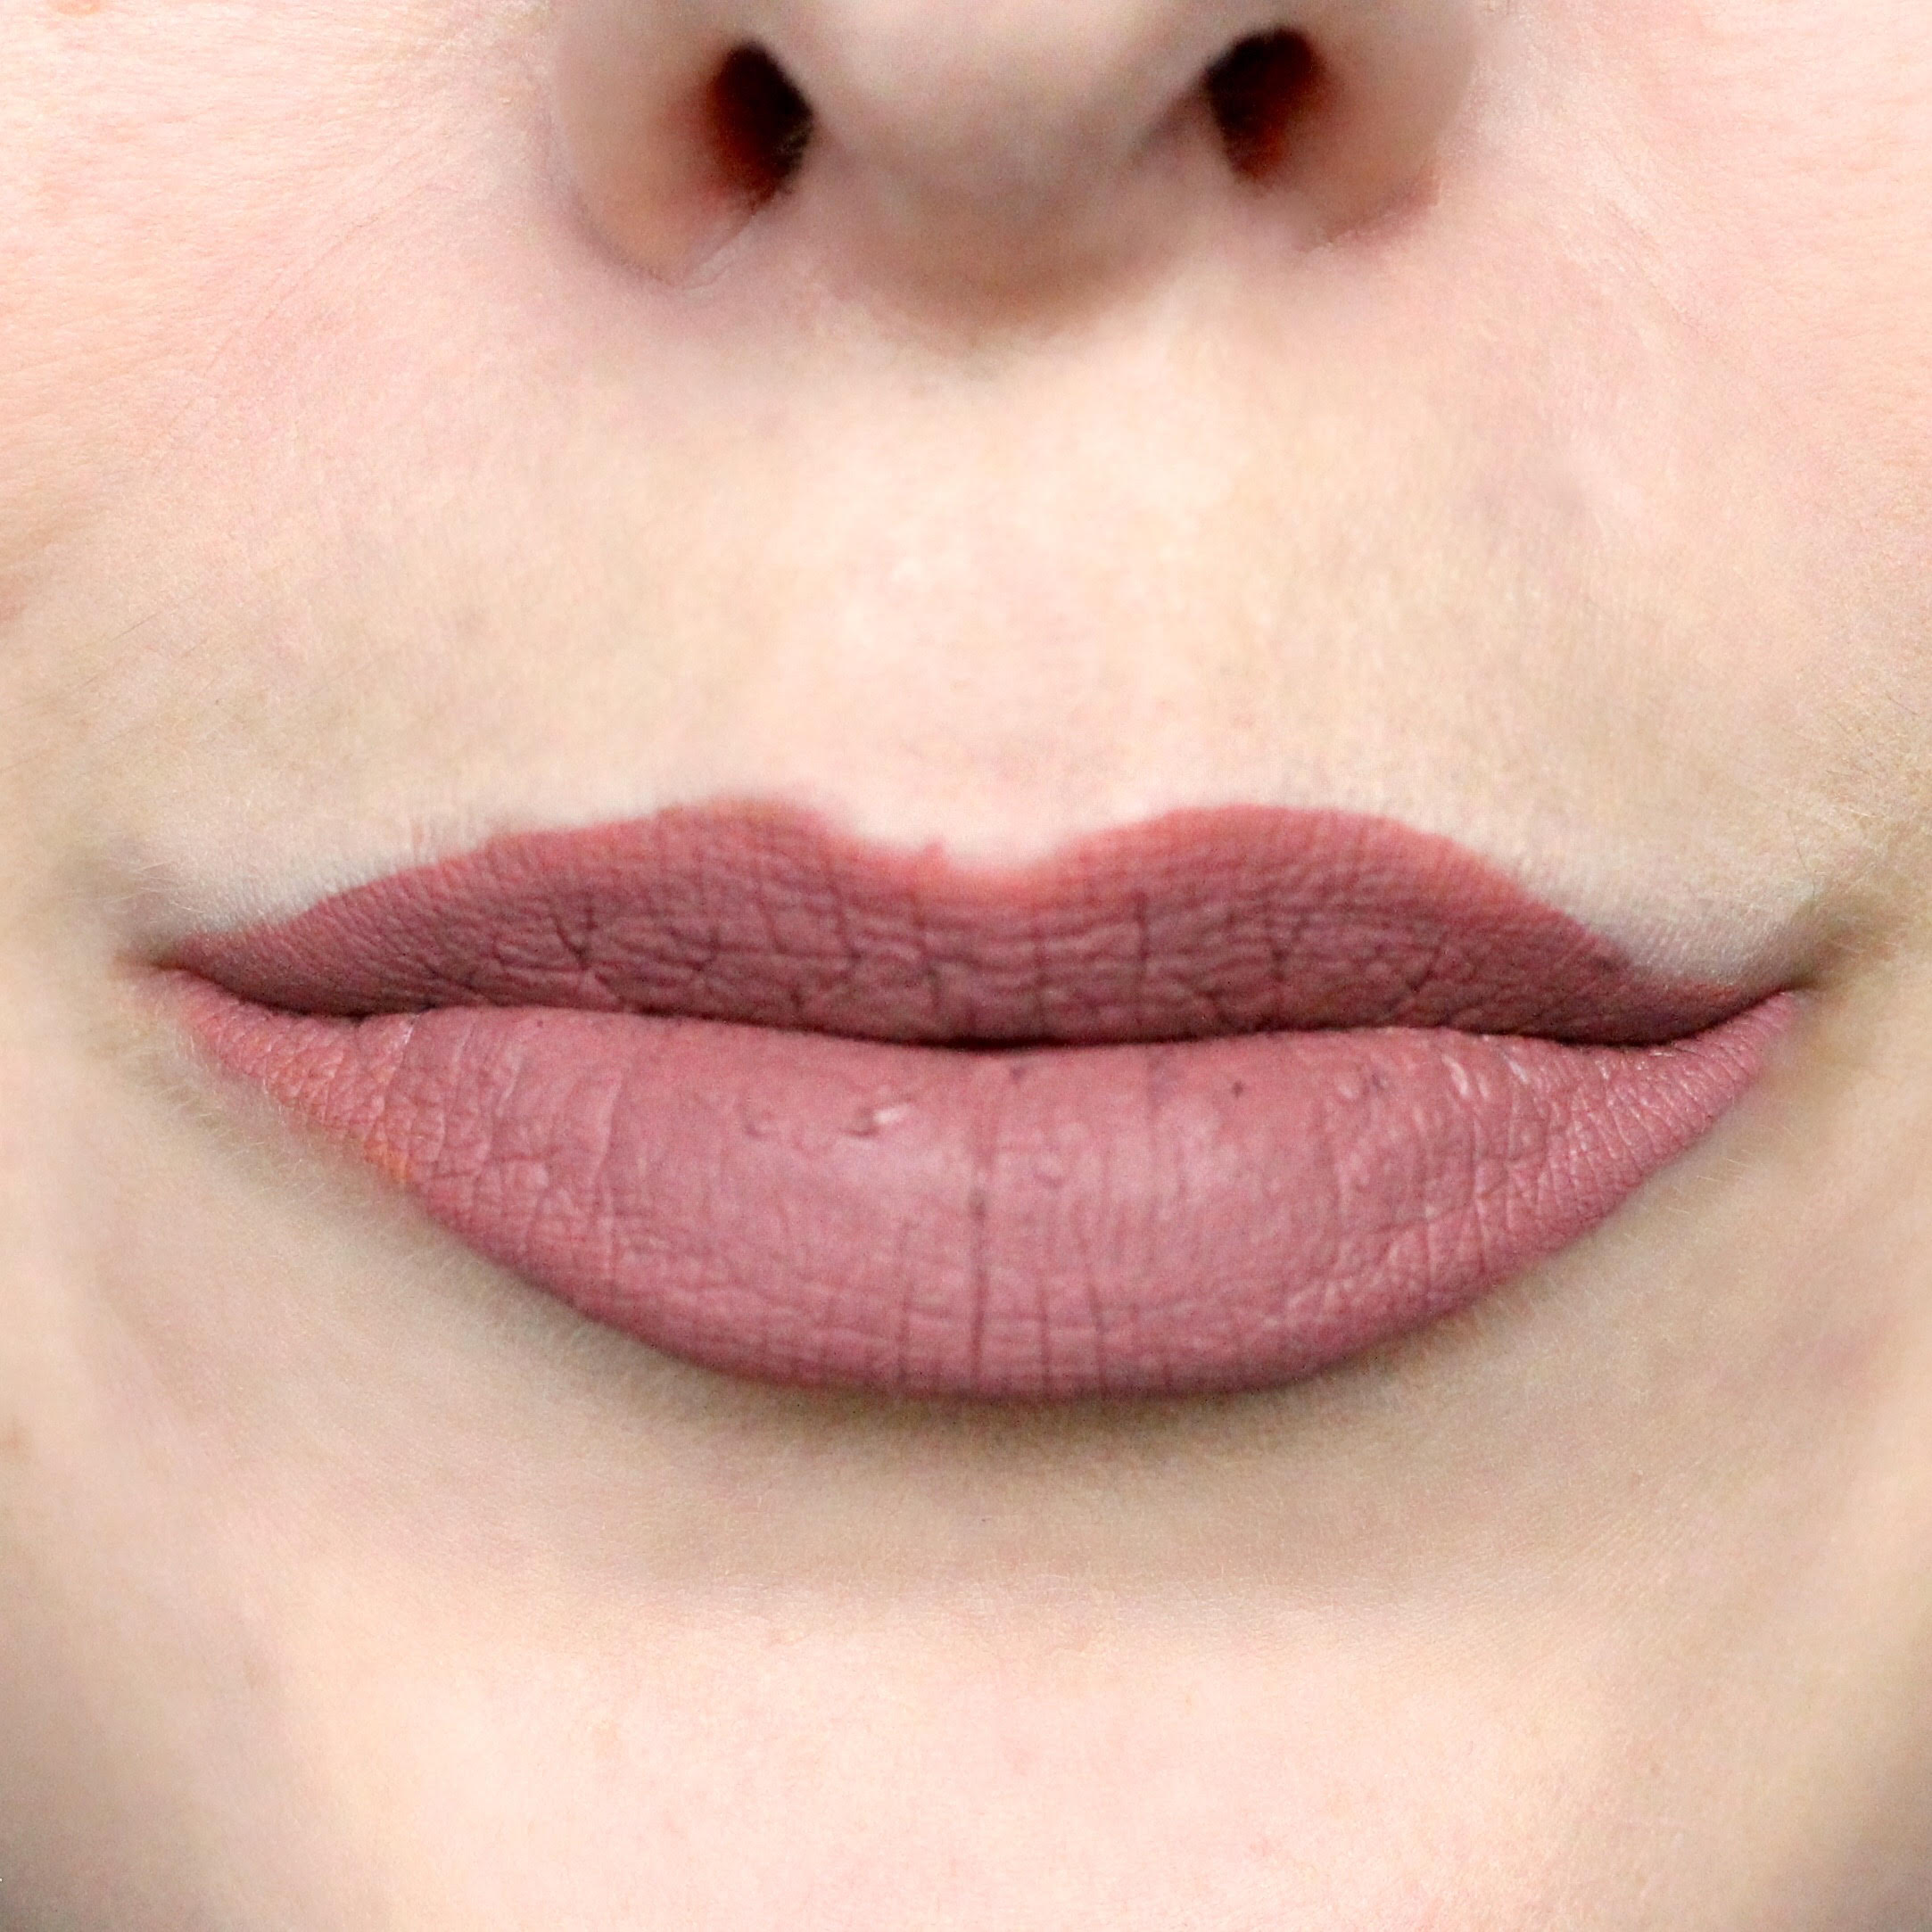 Make Up For Ever Artist Liquid Matte Lipstick in 105.